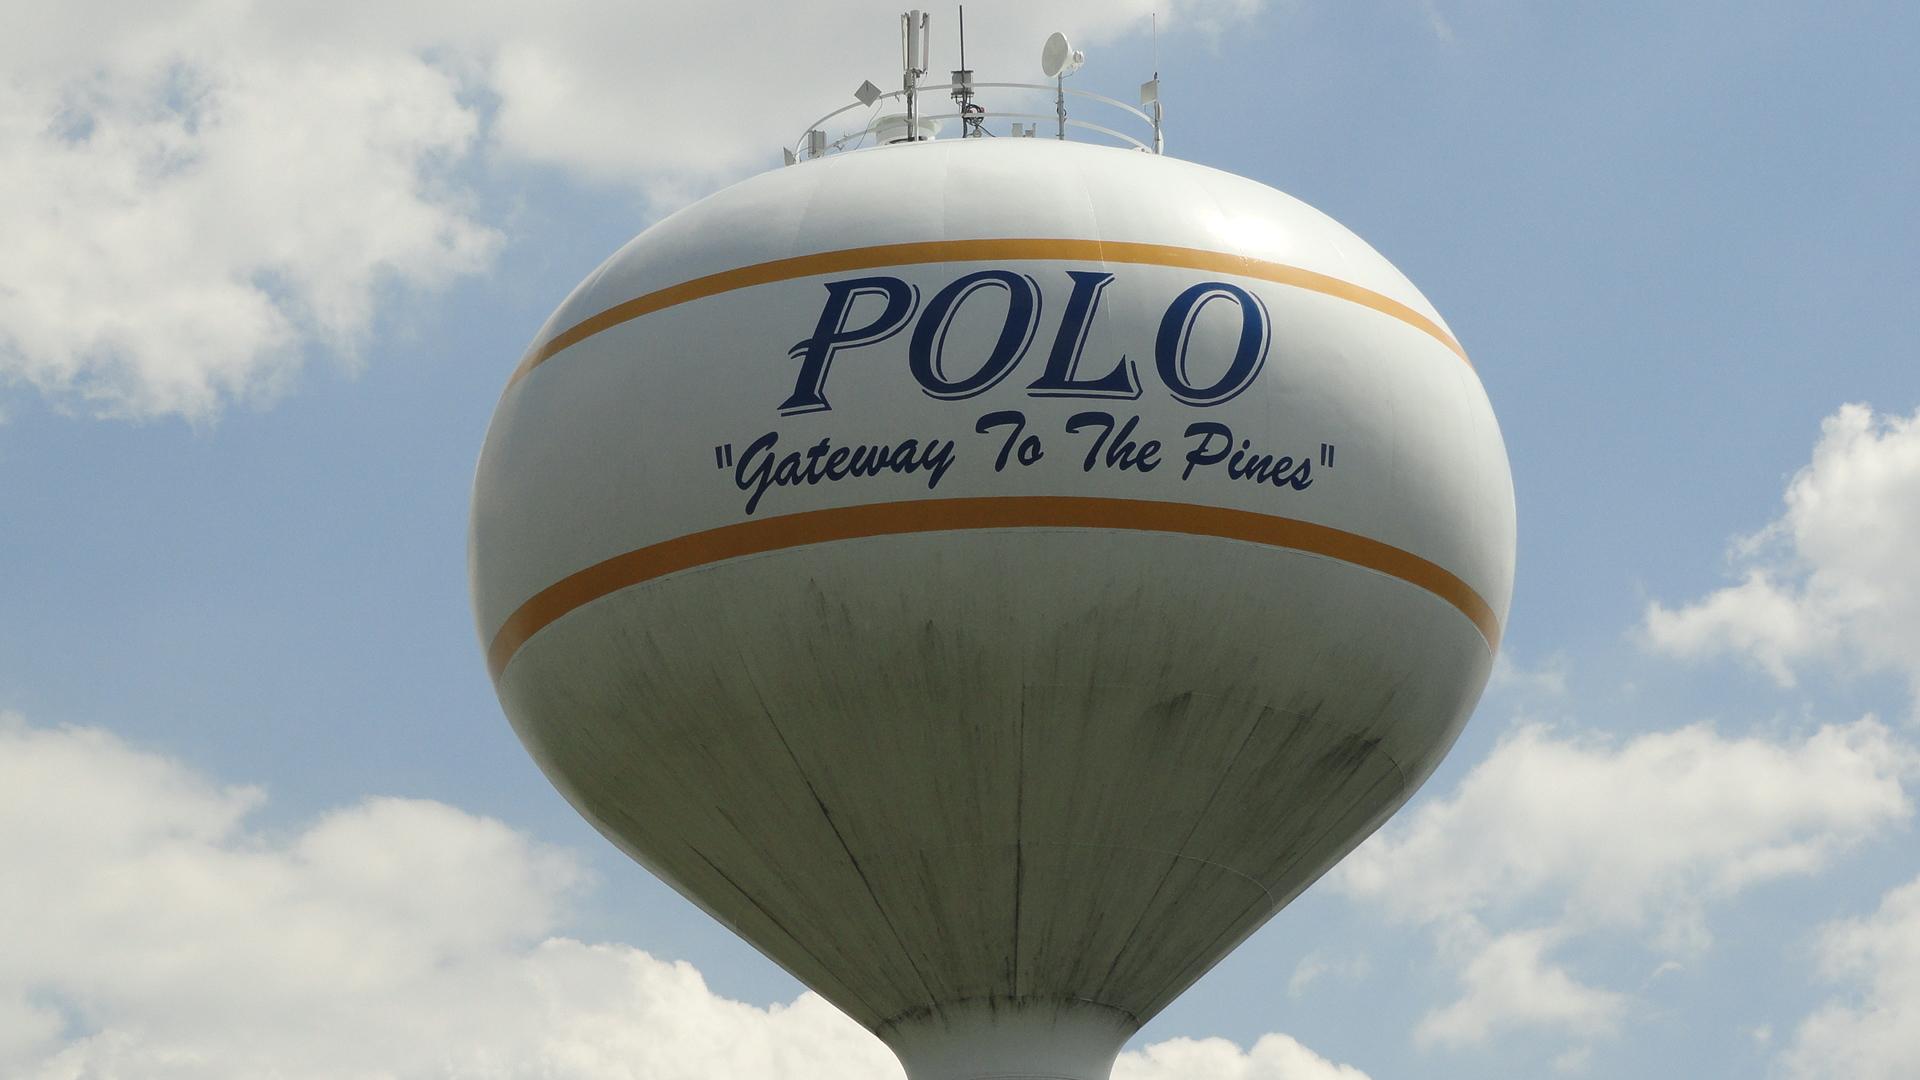 Illinois ogle county polo - Illinois Ogle County Polo 71